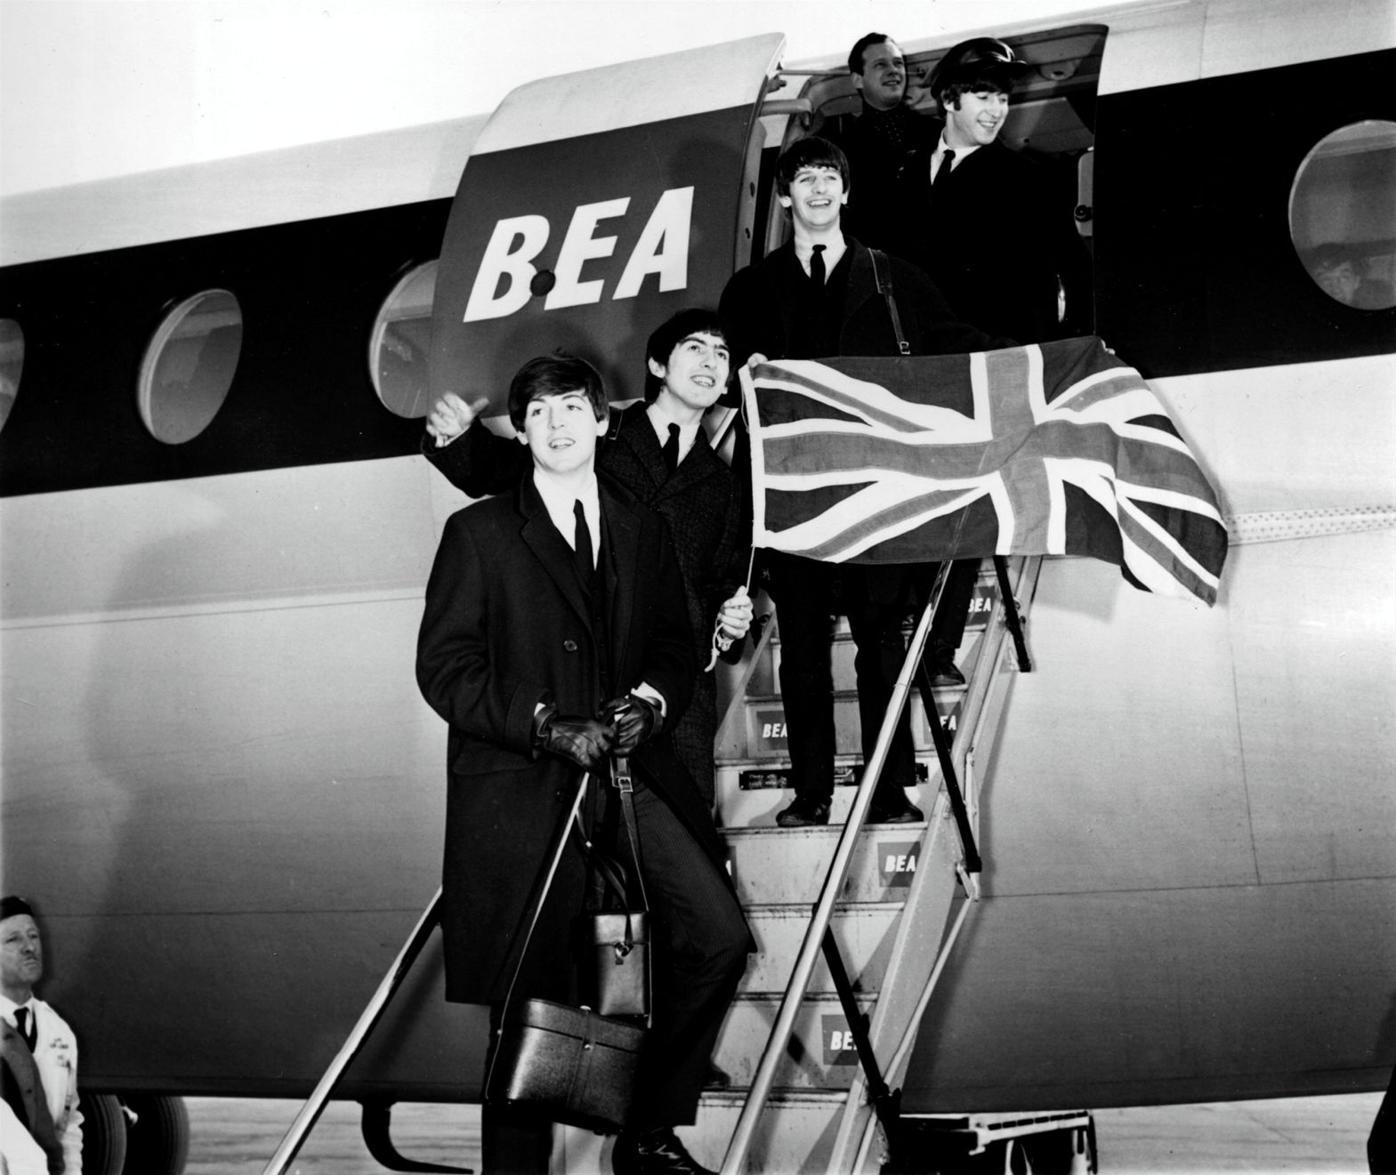 BEATLES RETURN LONDON